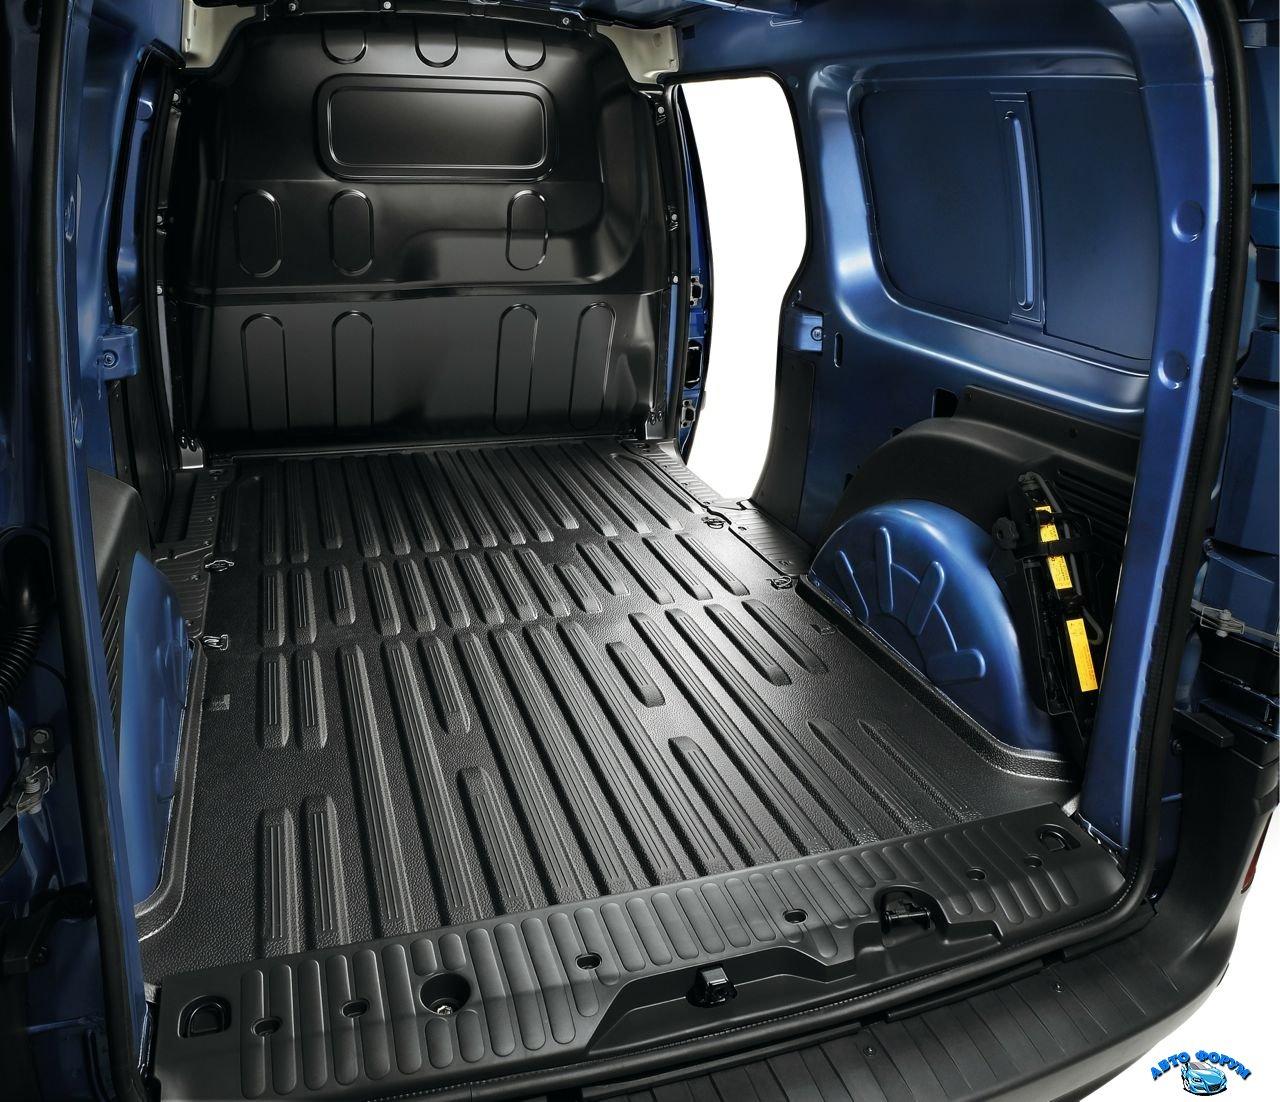 Renault-Kangoo-loading-area.jpg